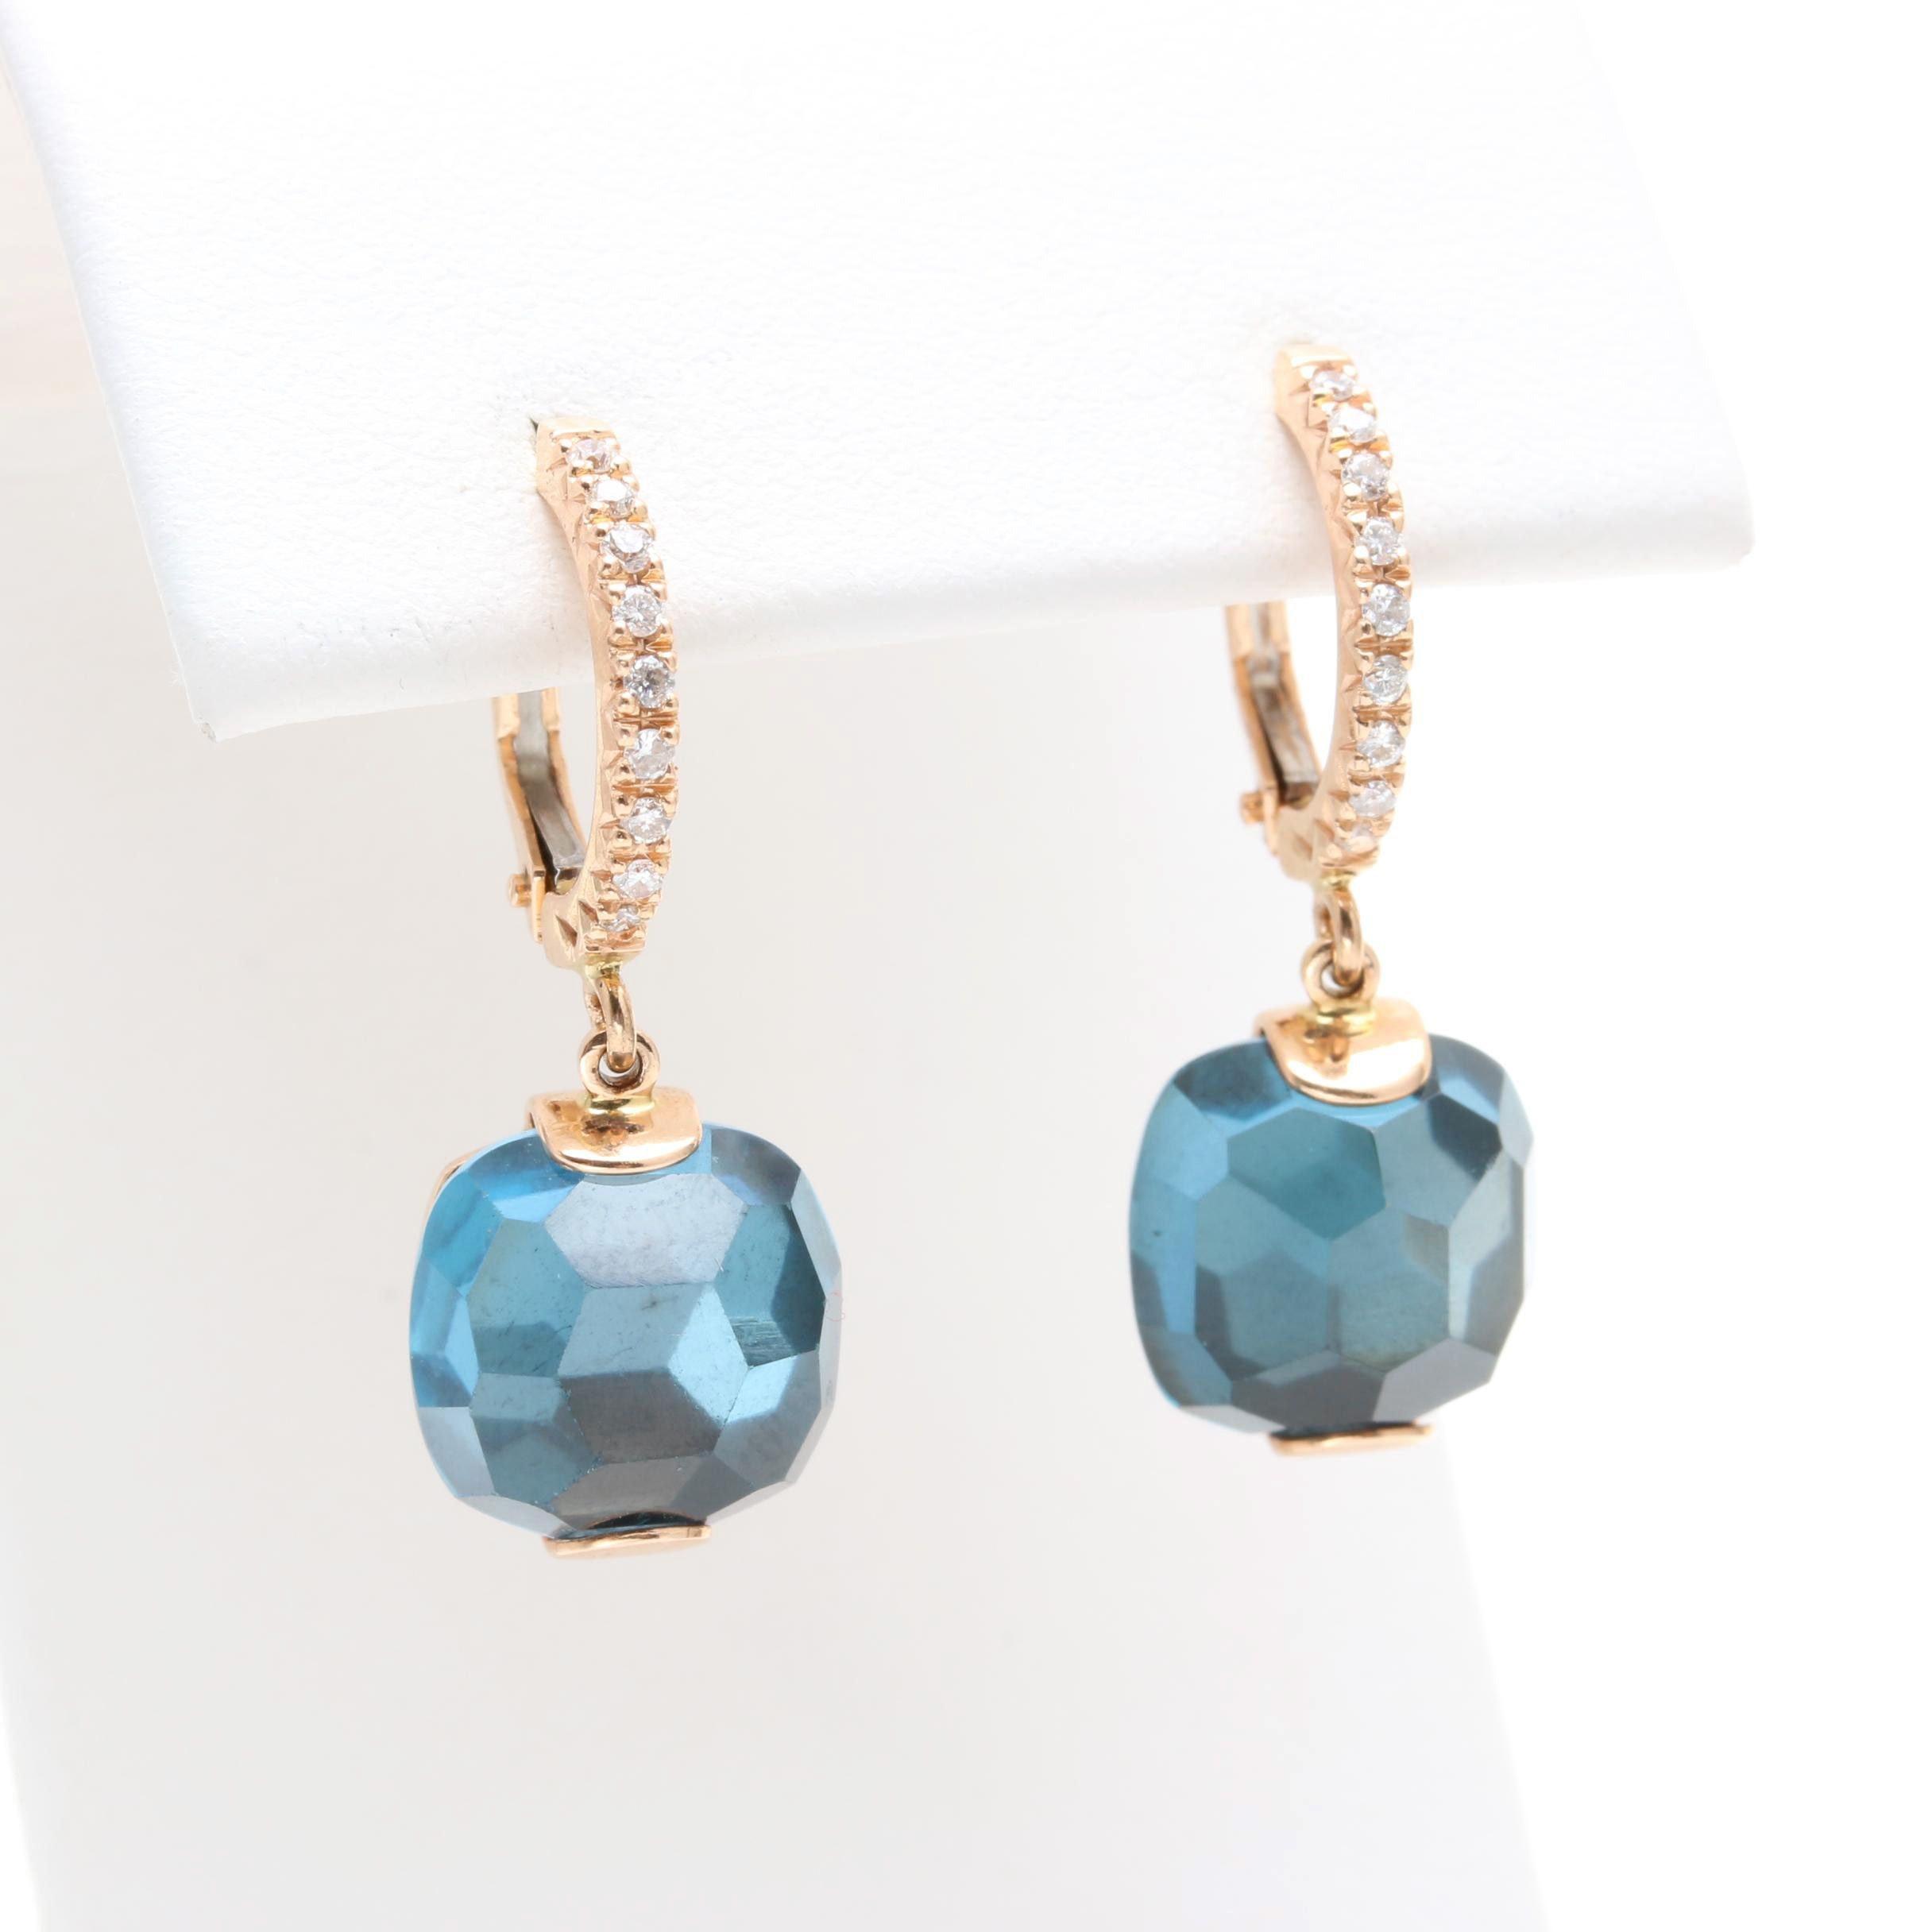 Zoccai 18K Yellow Gold Blue Topaz and Diamond Earrings